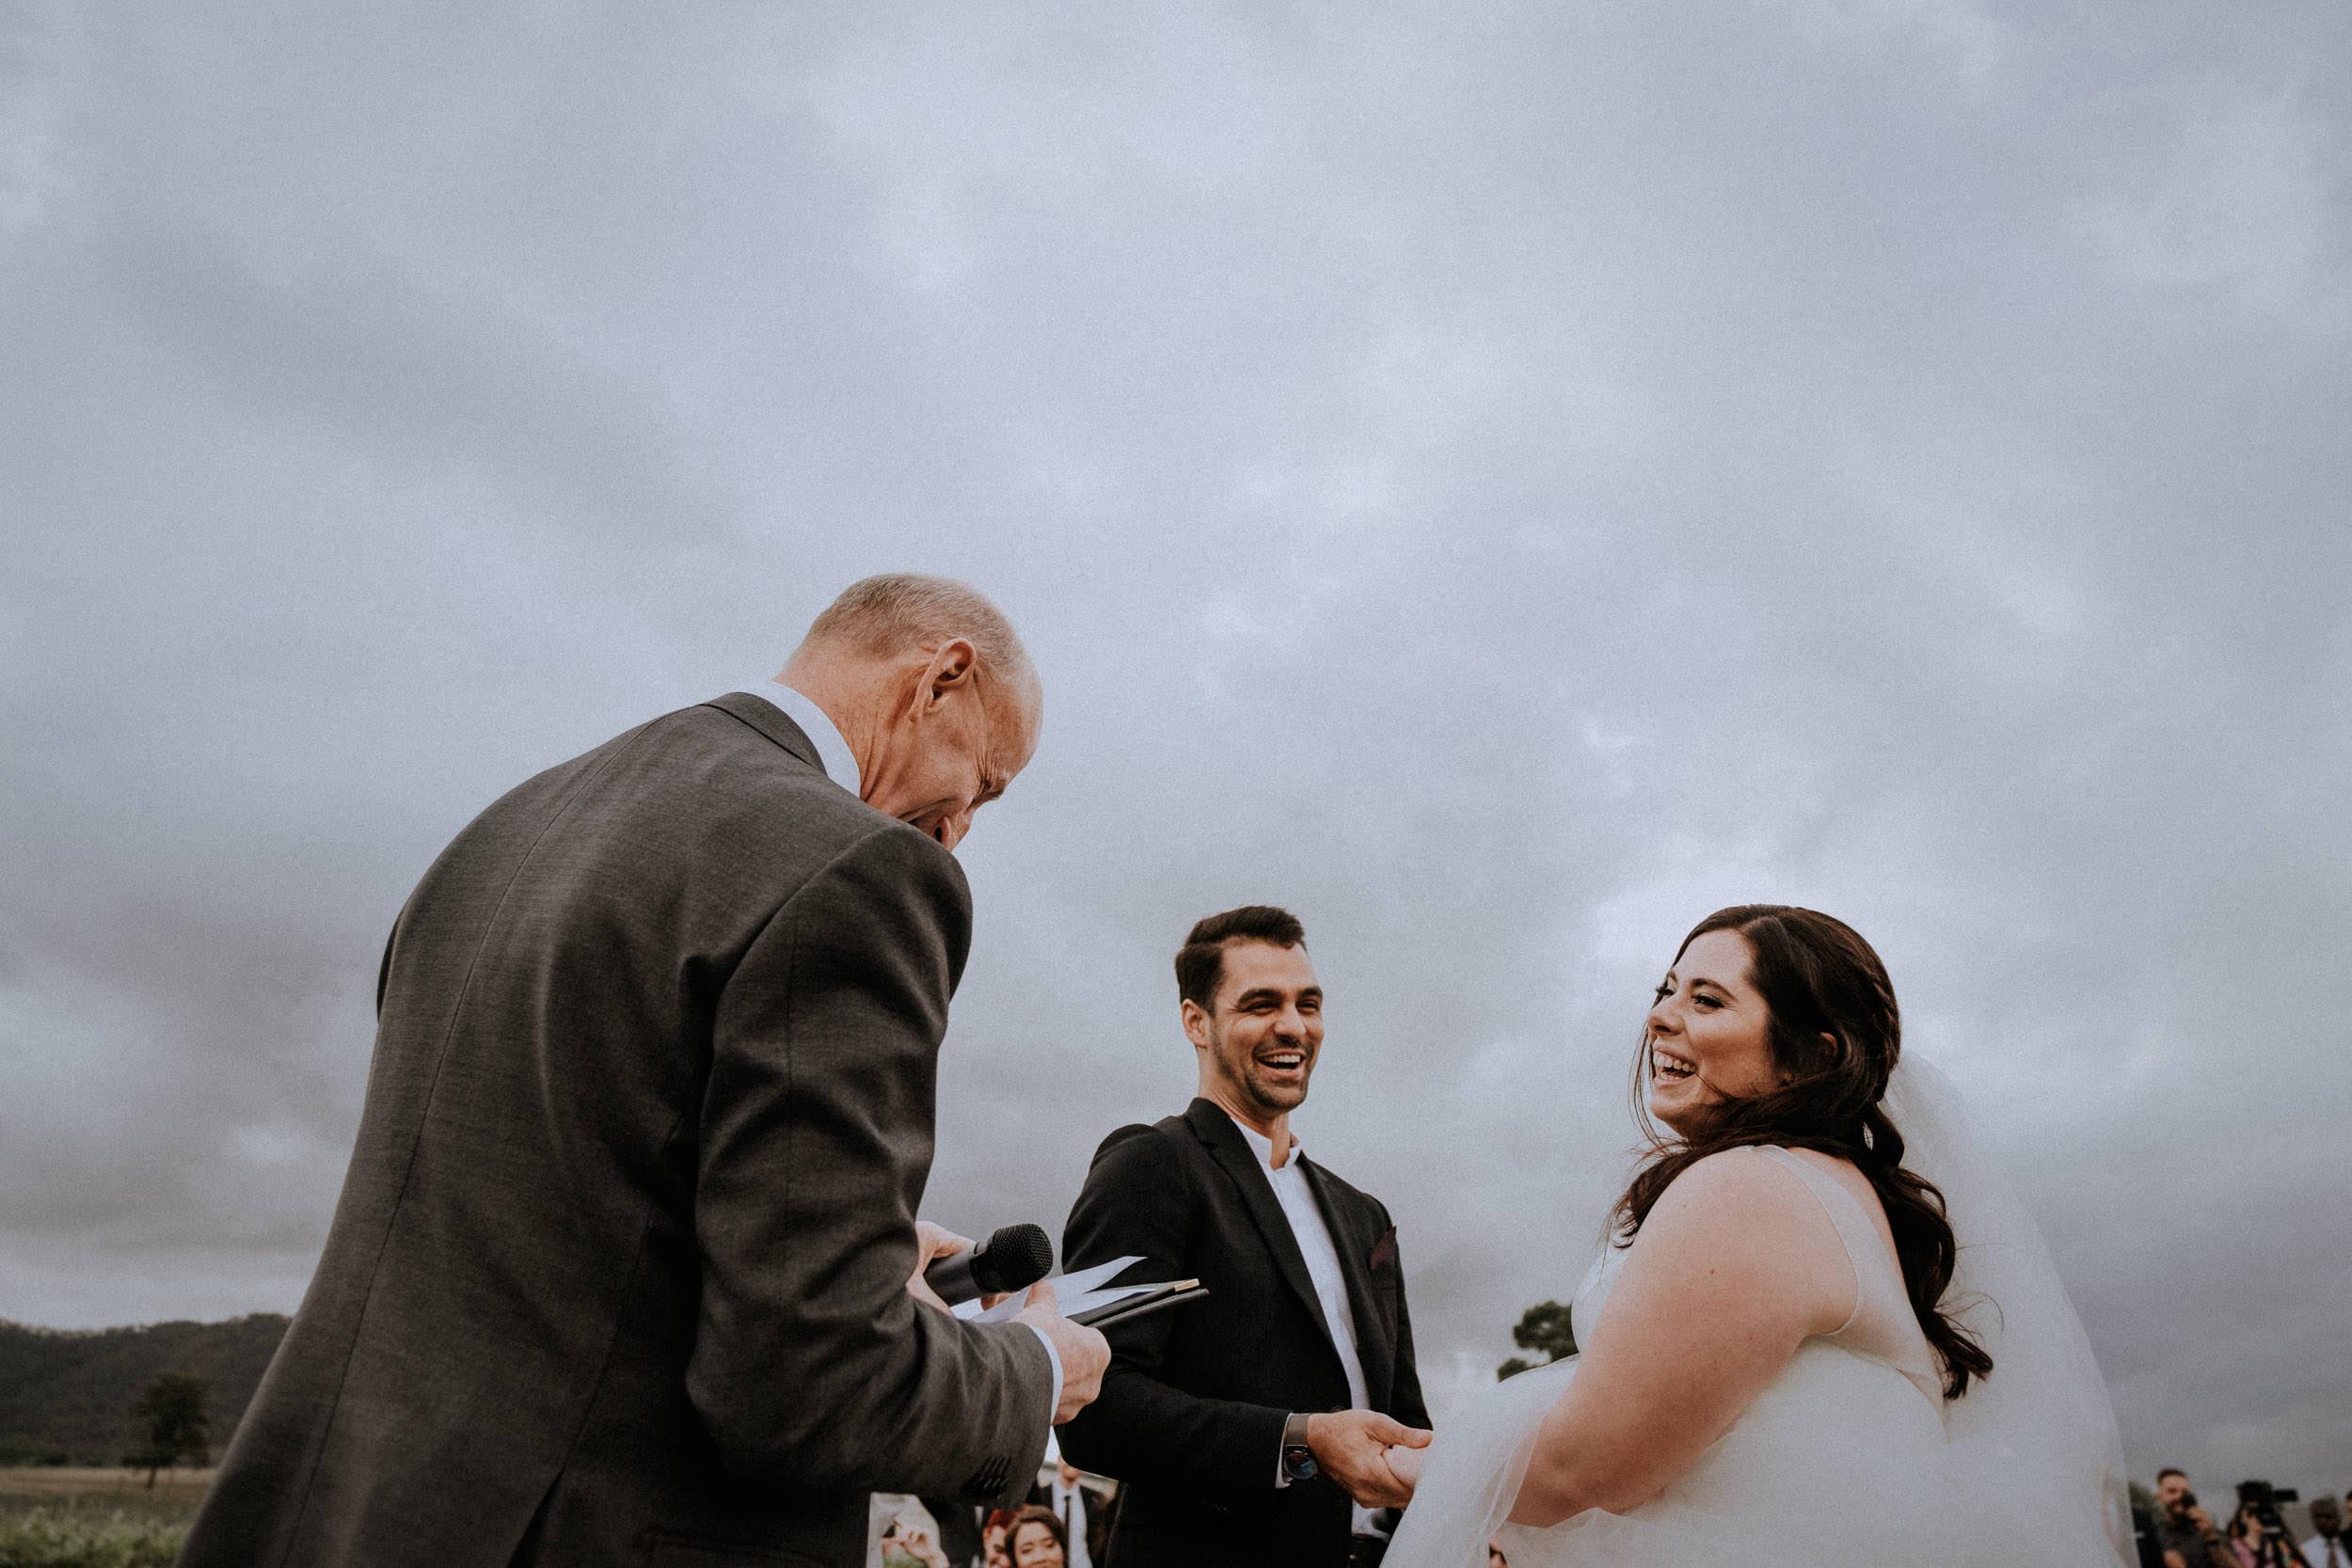 s+j_top_elopement wedding photography_kings & thieves_blog - 292.jpg